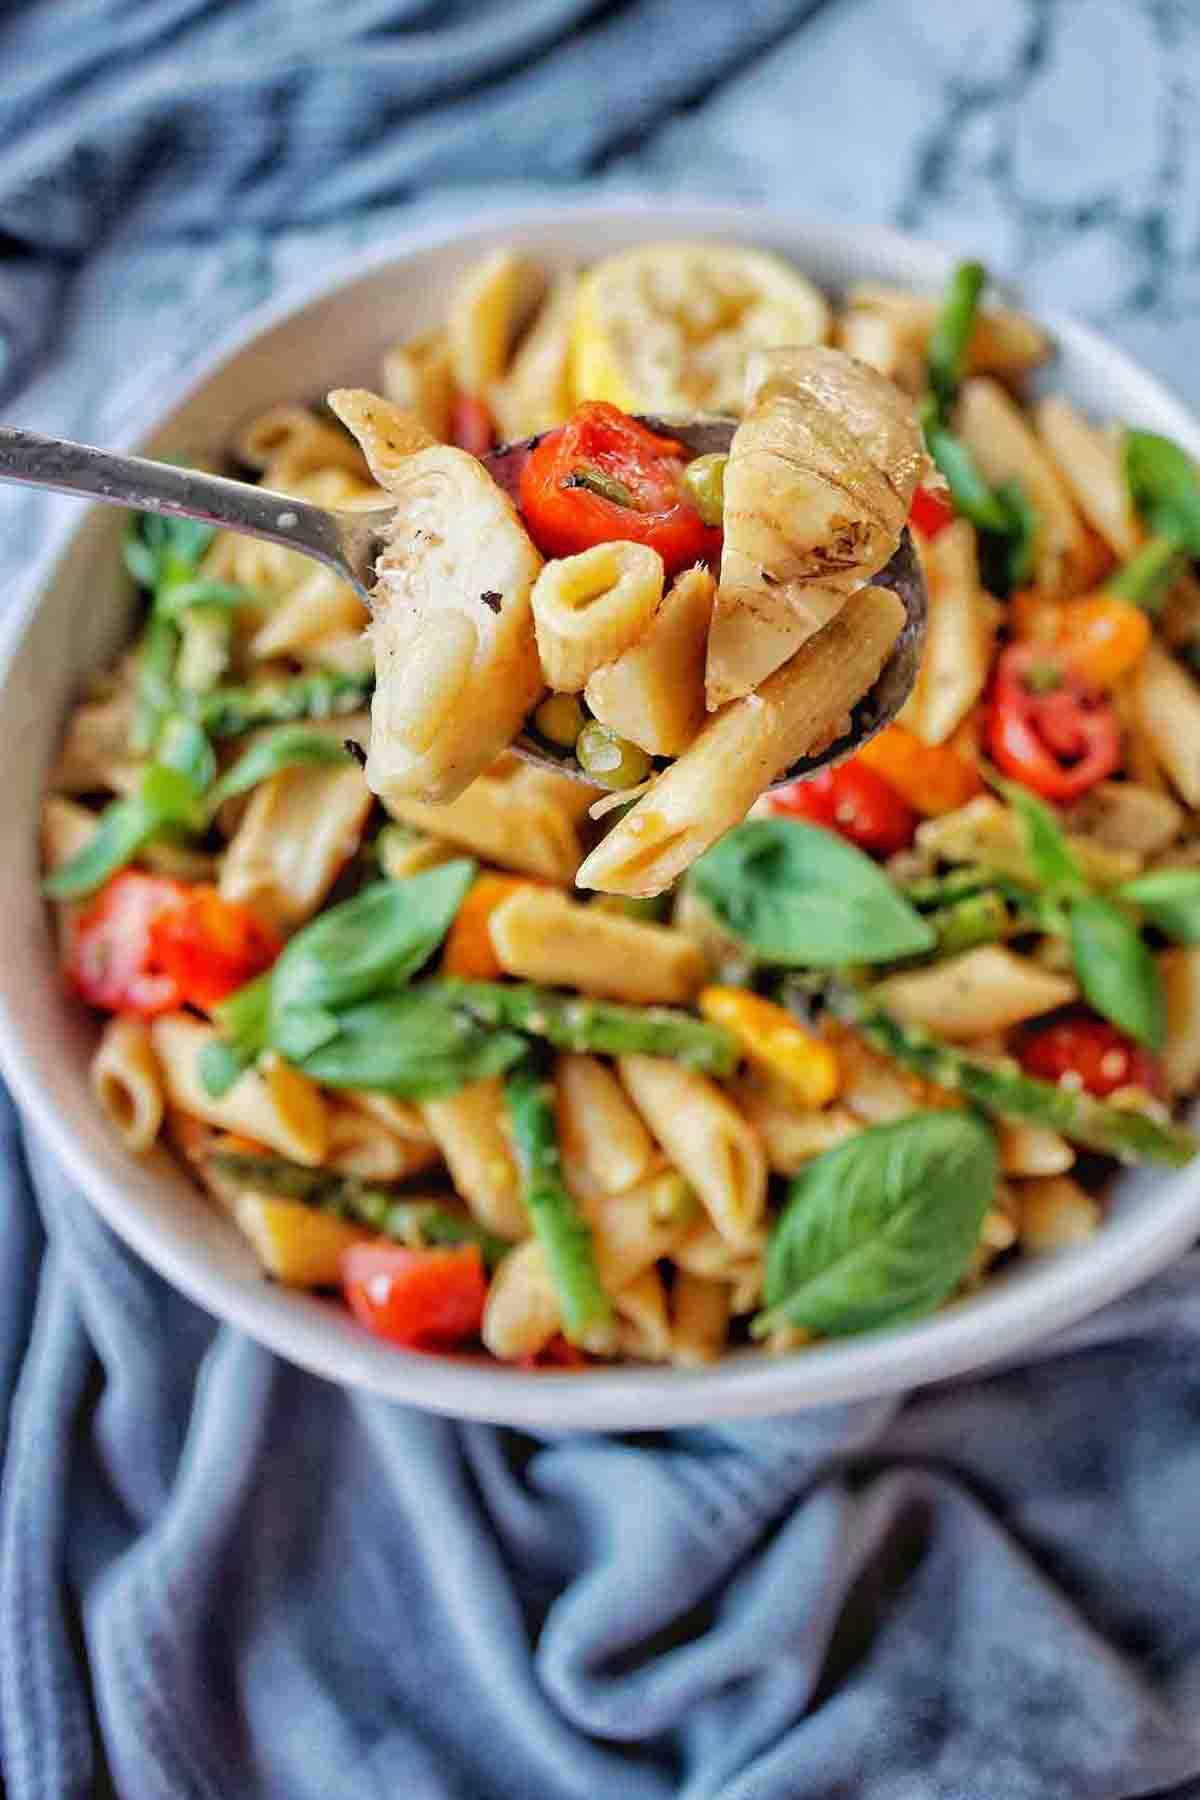 Spoon holding primavera pasta above bowl of the same